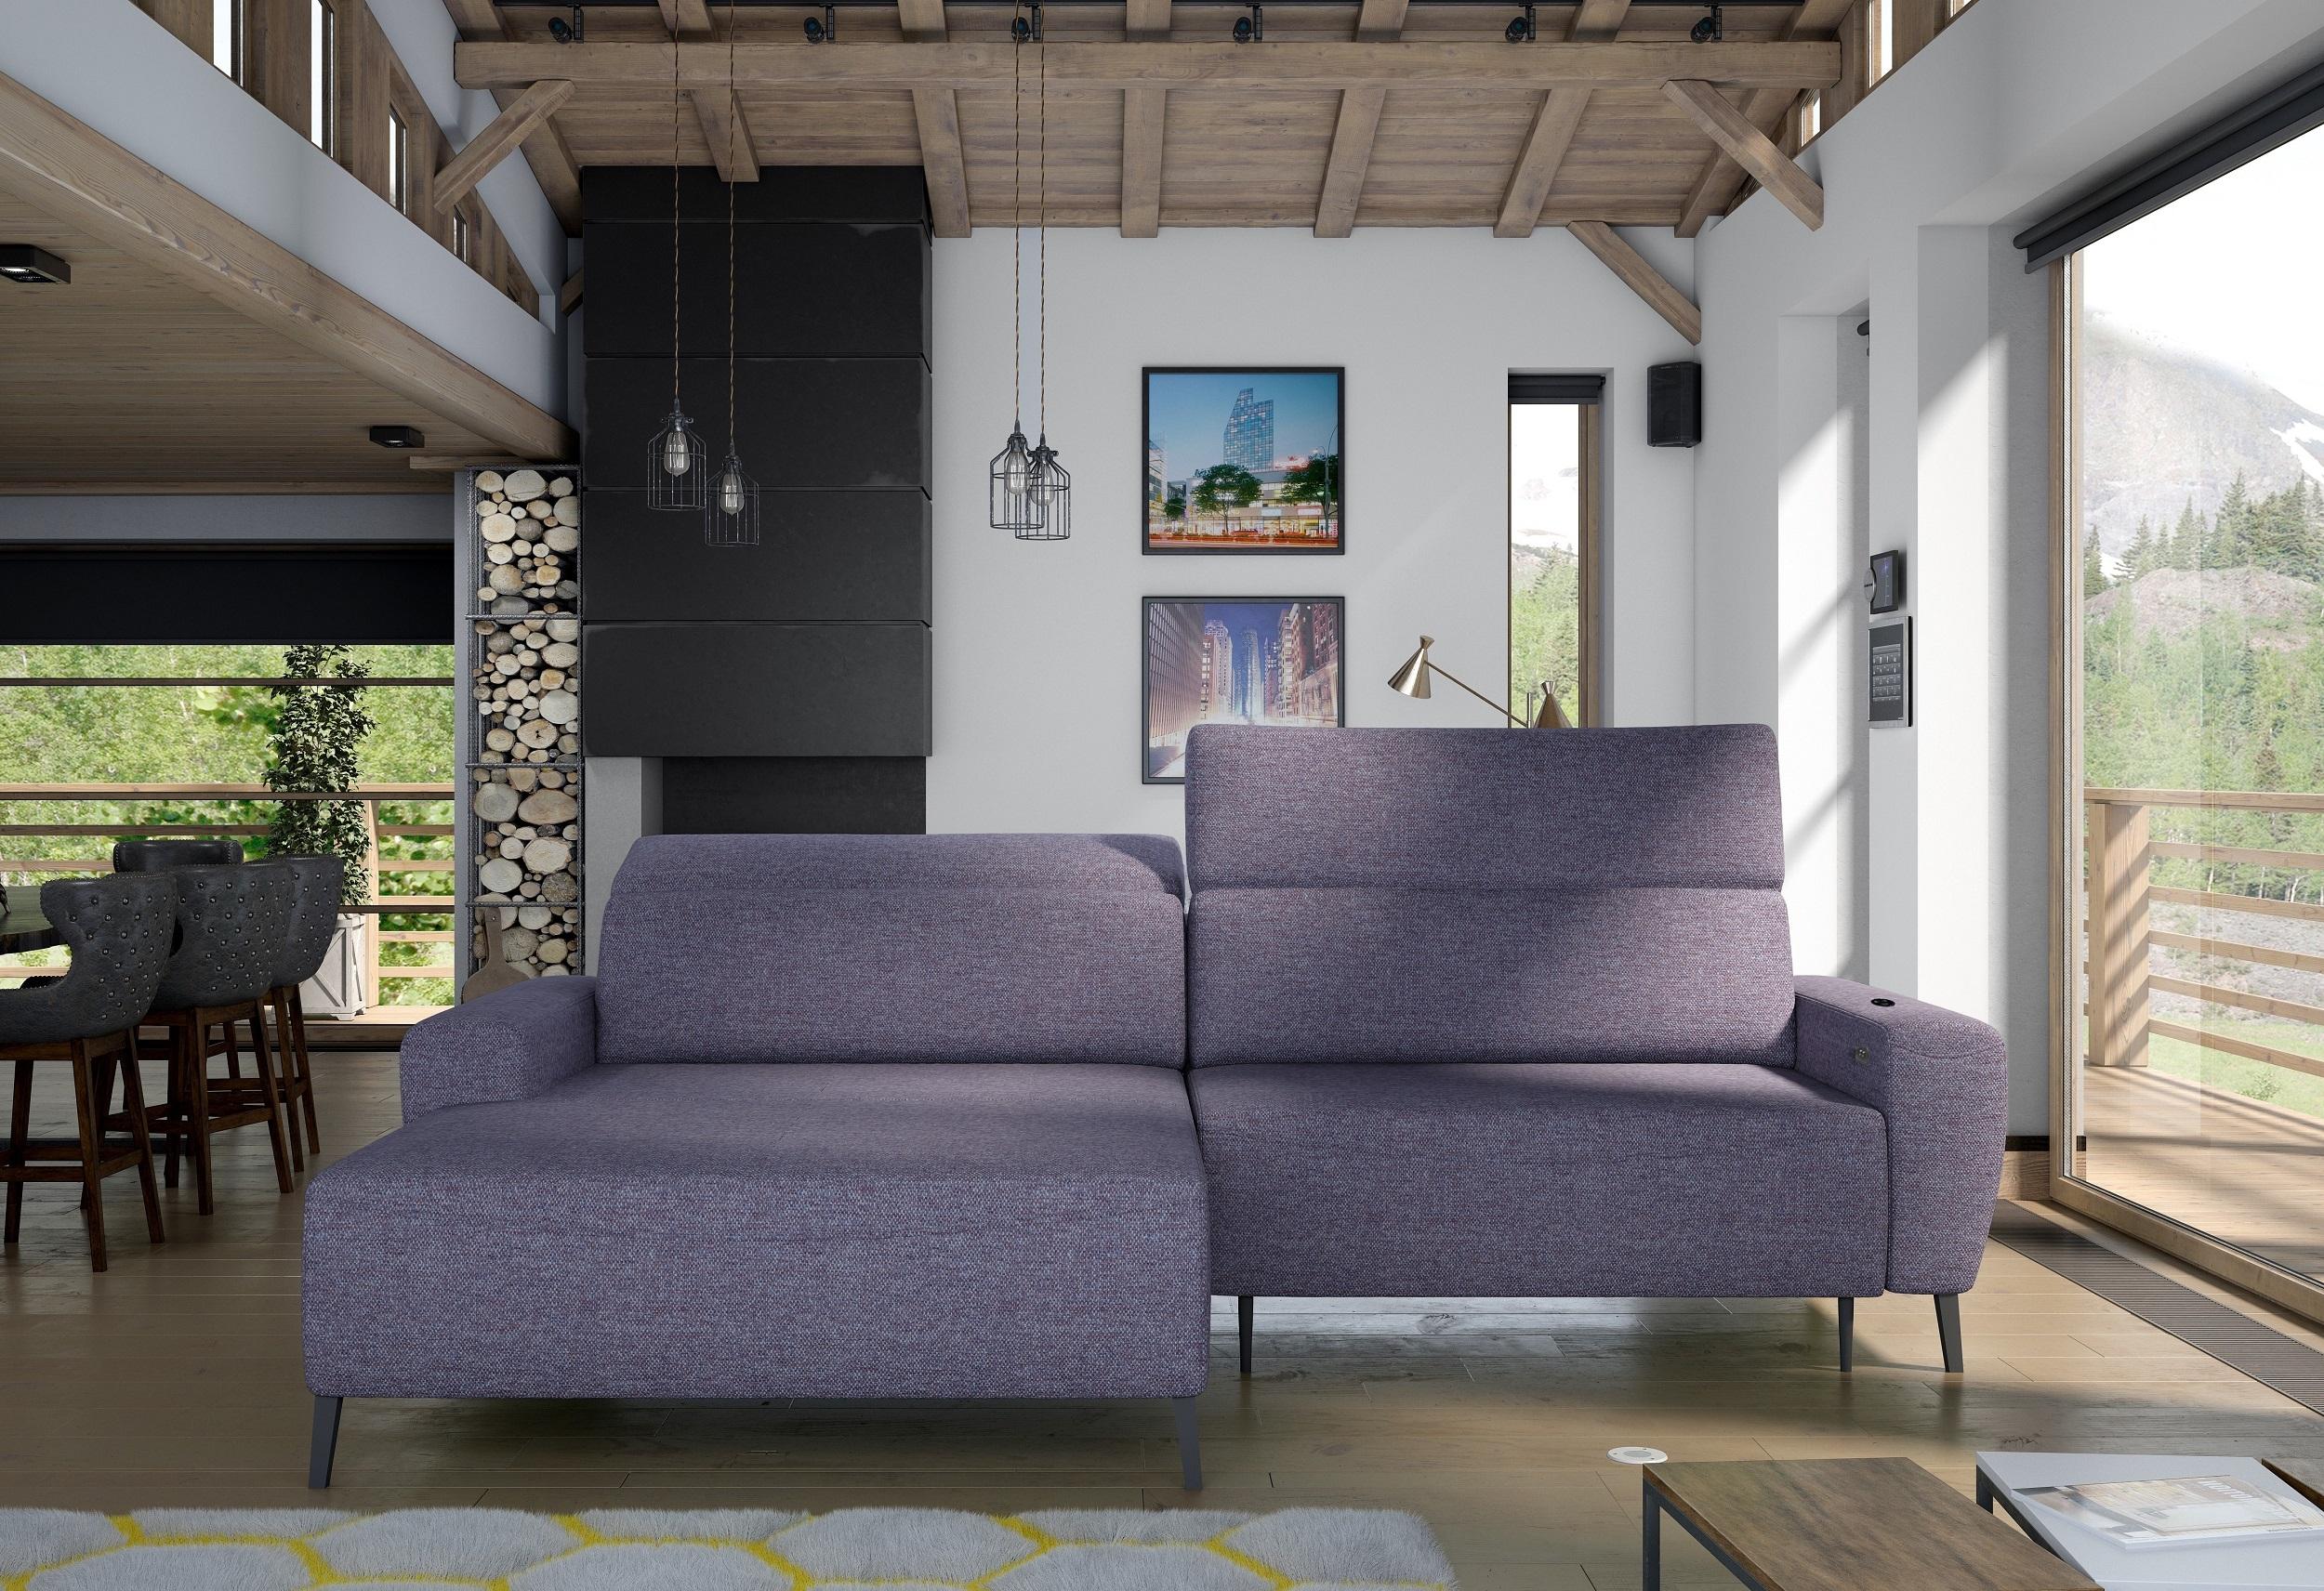 Coltar fix cu mecanism electric Relax, cu sezlong pe stanga, tapitat cu stofa Stream Bleumarin, l285xA178xH78 cm